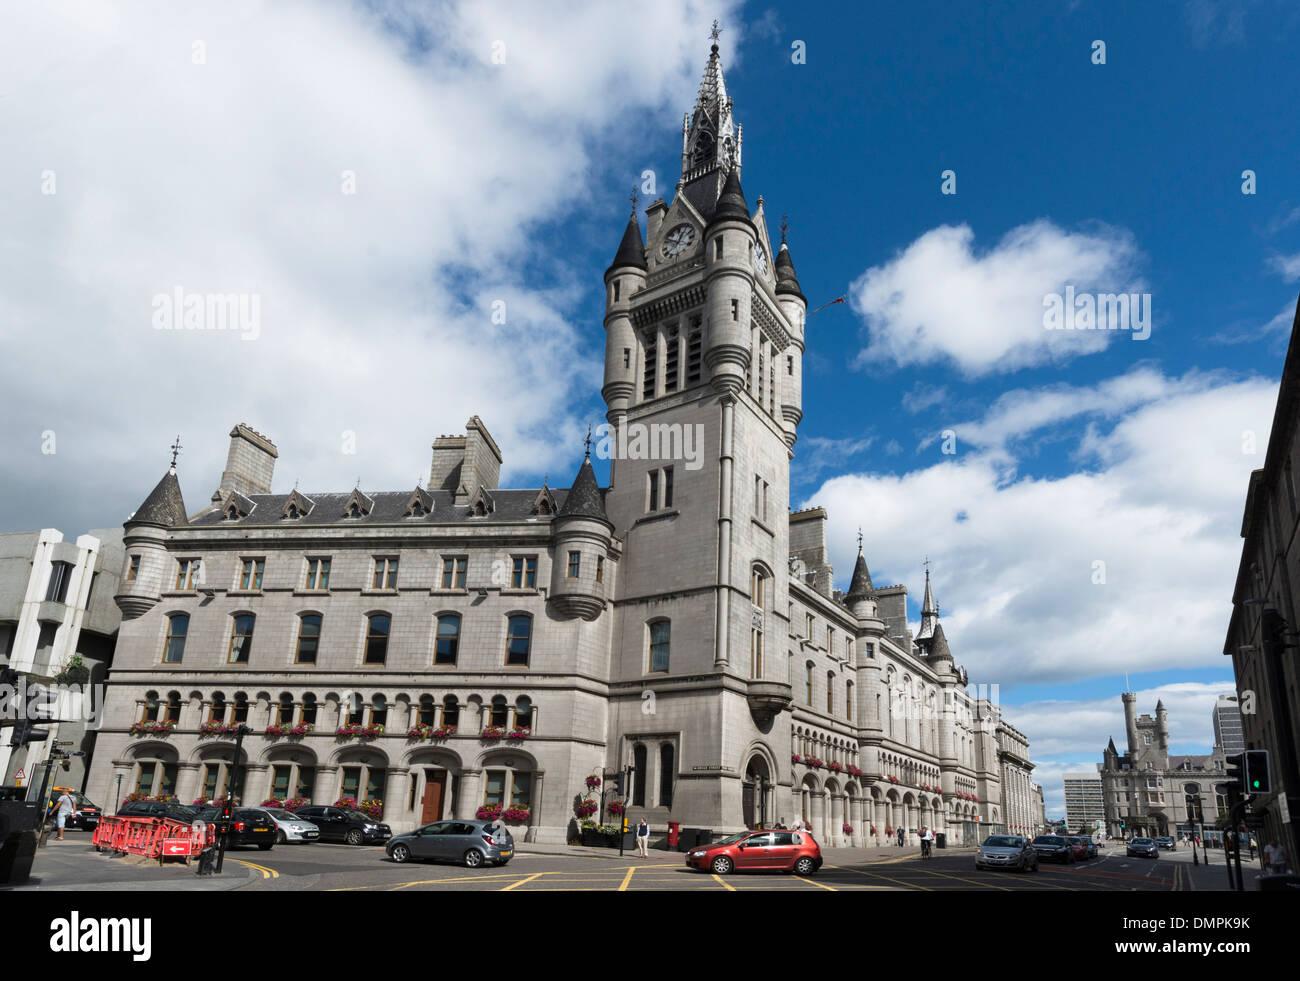 aberdeen granite city townhouse union street - Stock Image